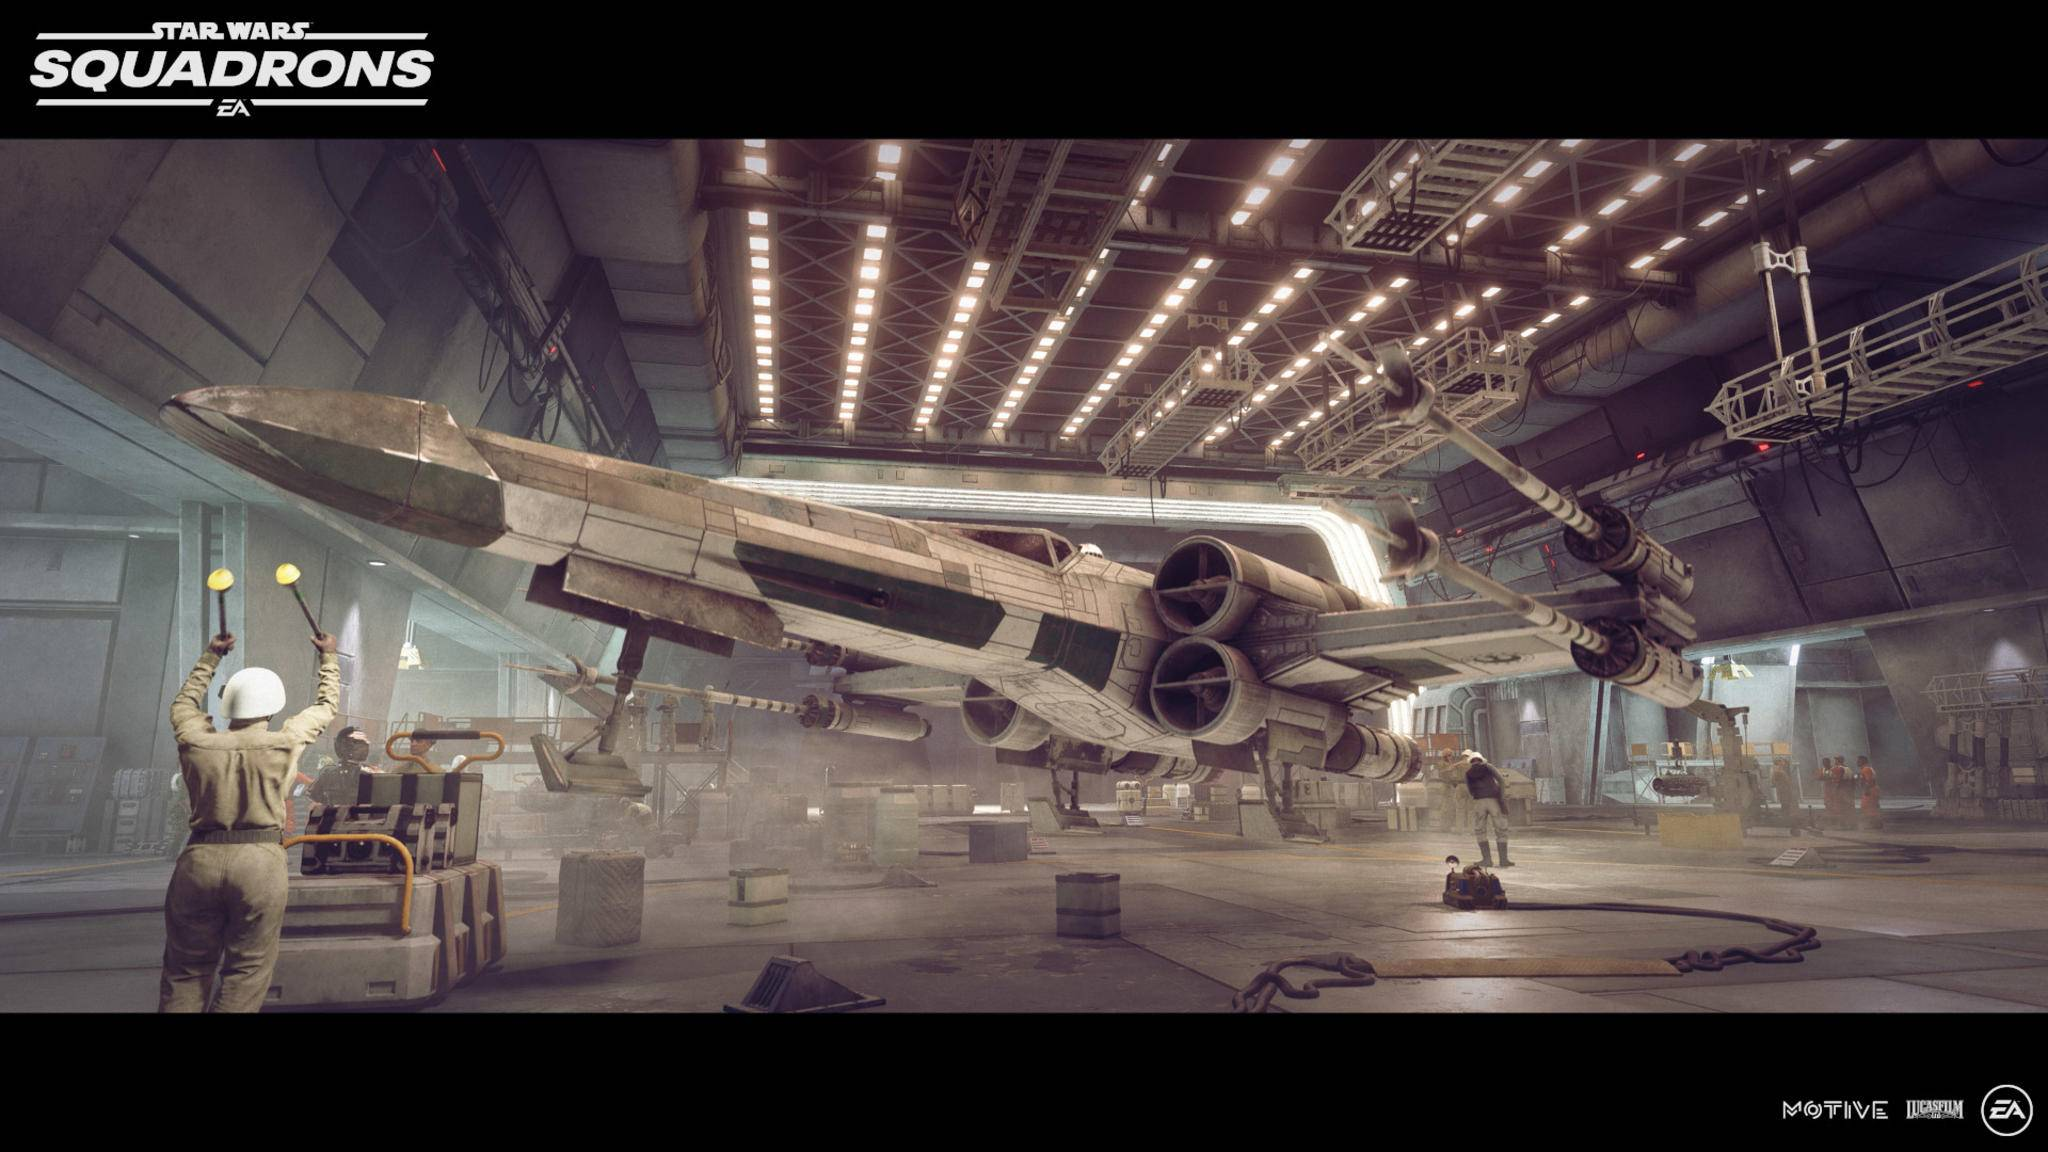 star-wars-squadrons-x-wing-hangar